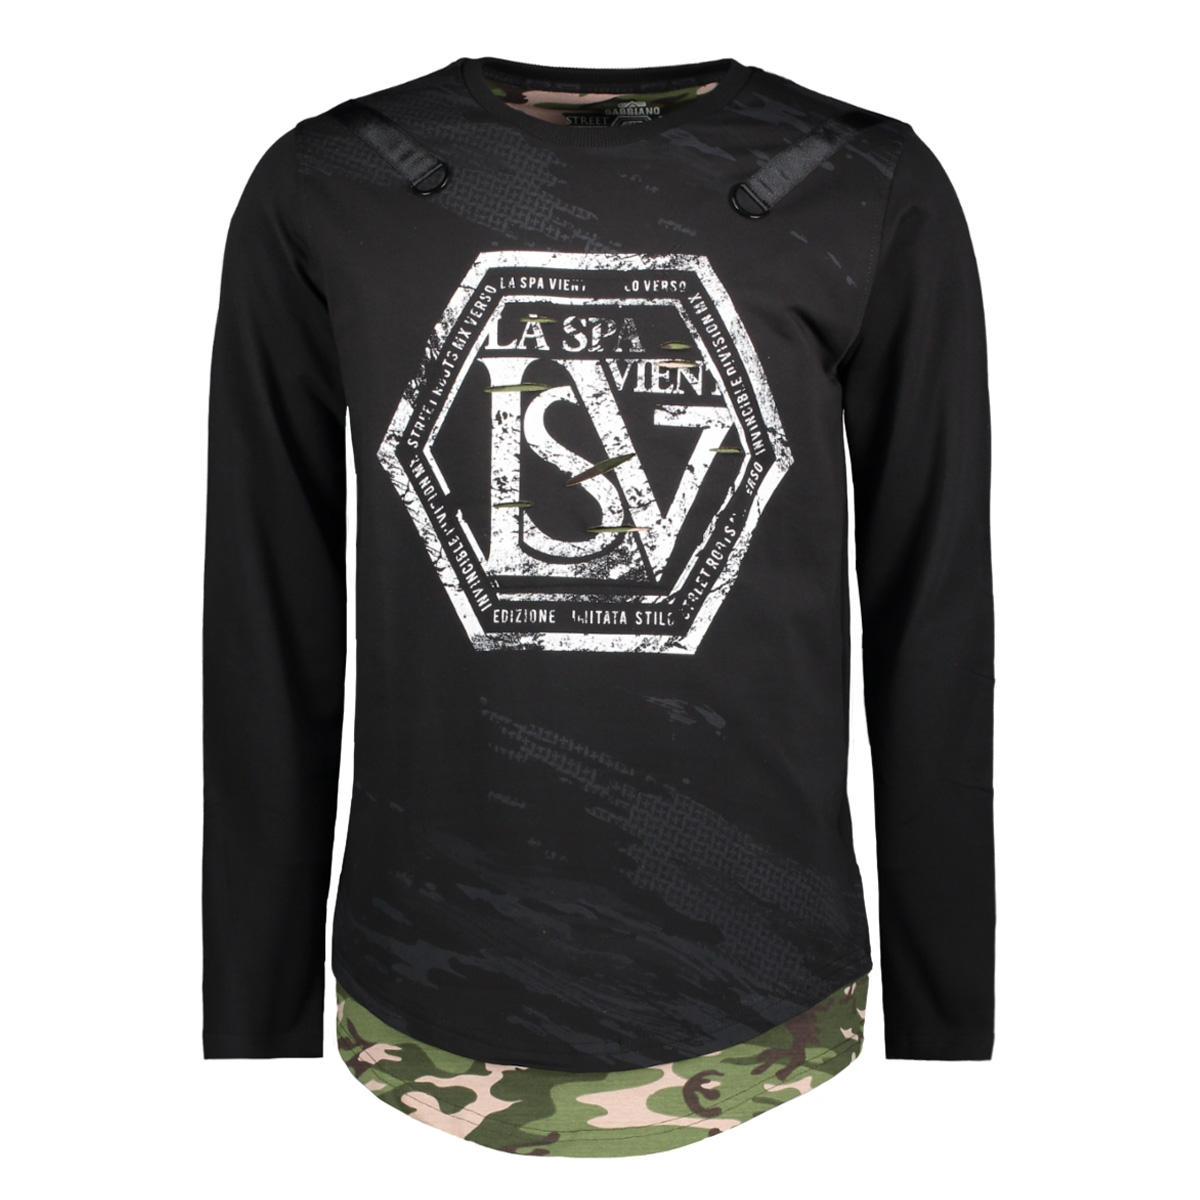 76106 gabbiano t-shirt black